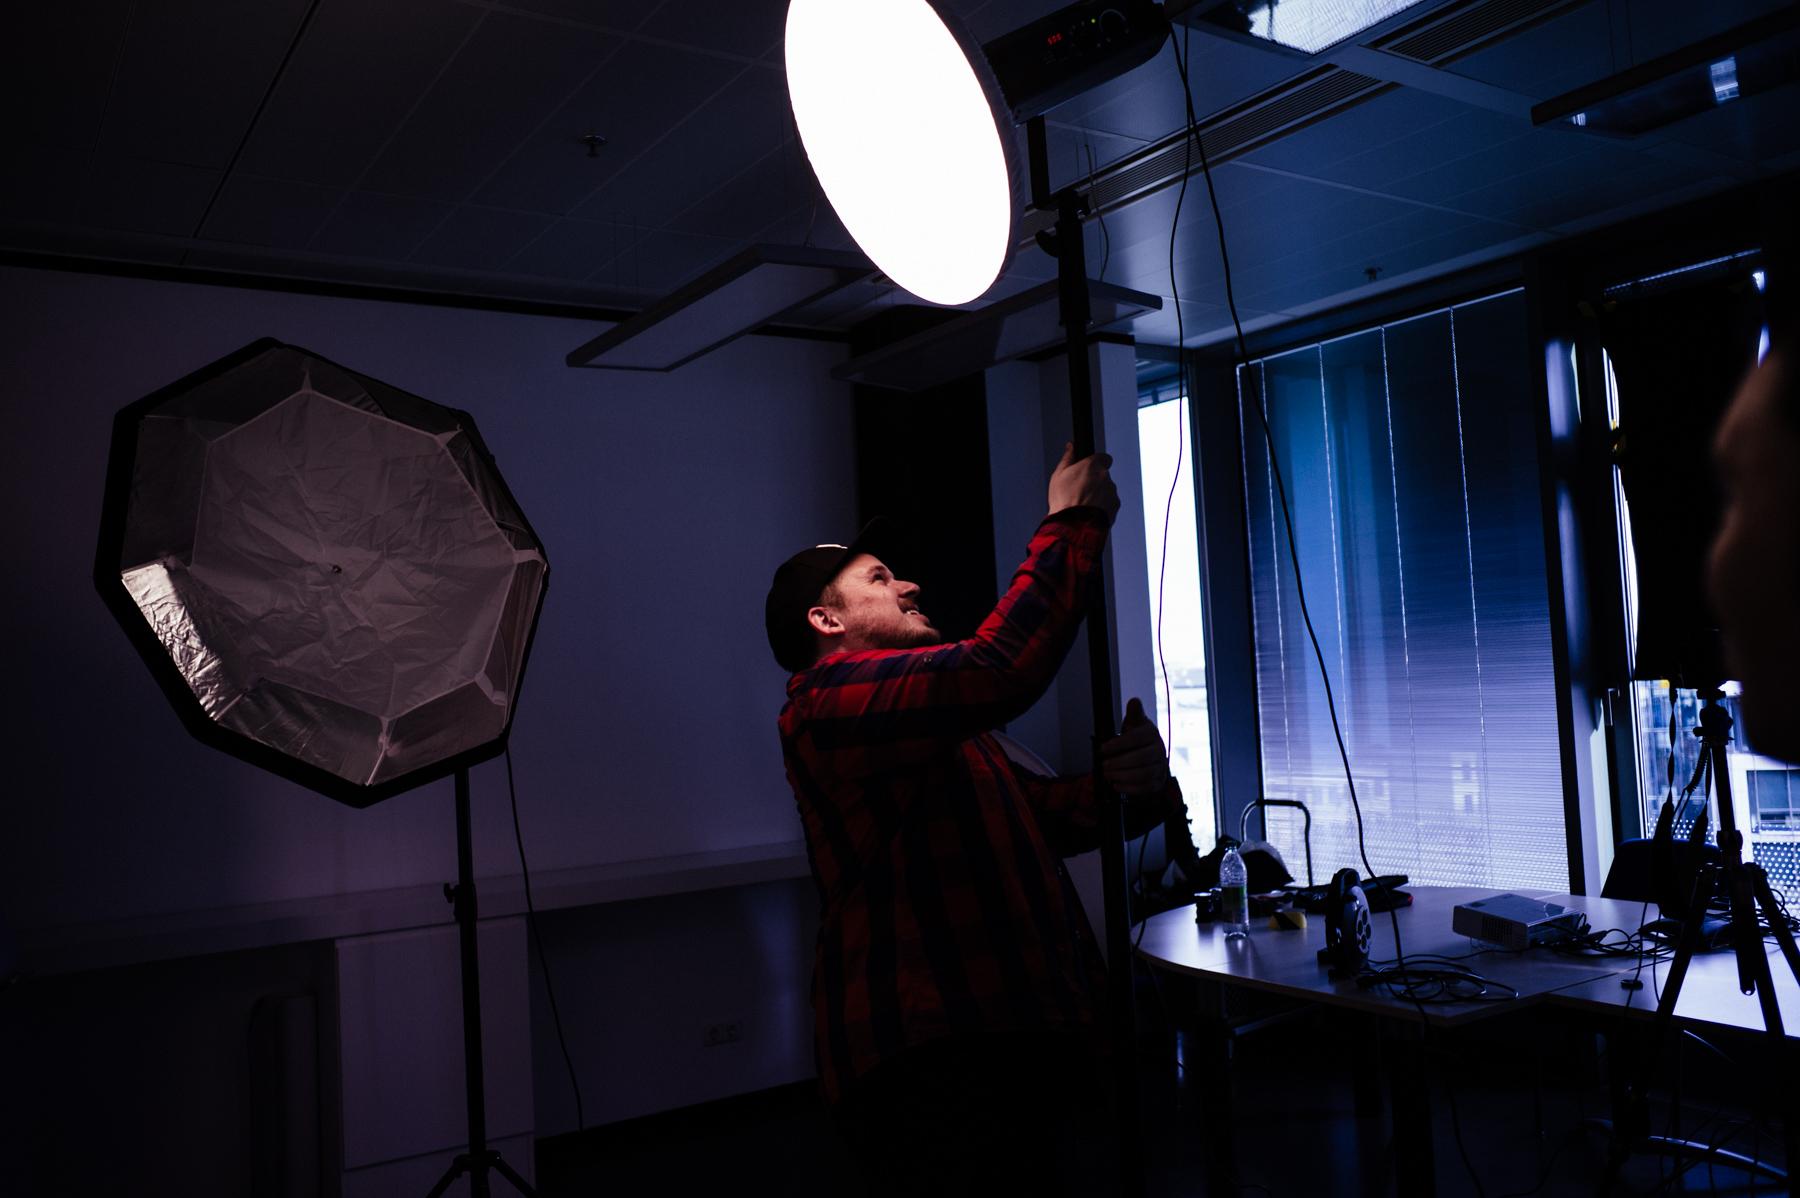 andre-duhme-fotograf-mu%cc%88nchenl1010877